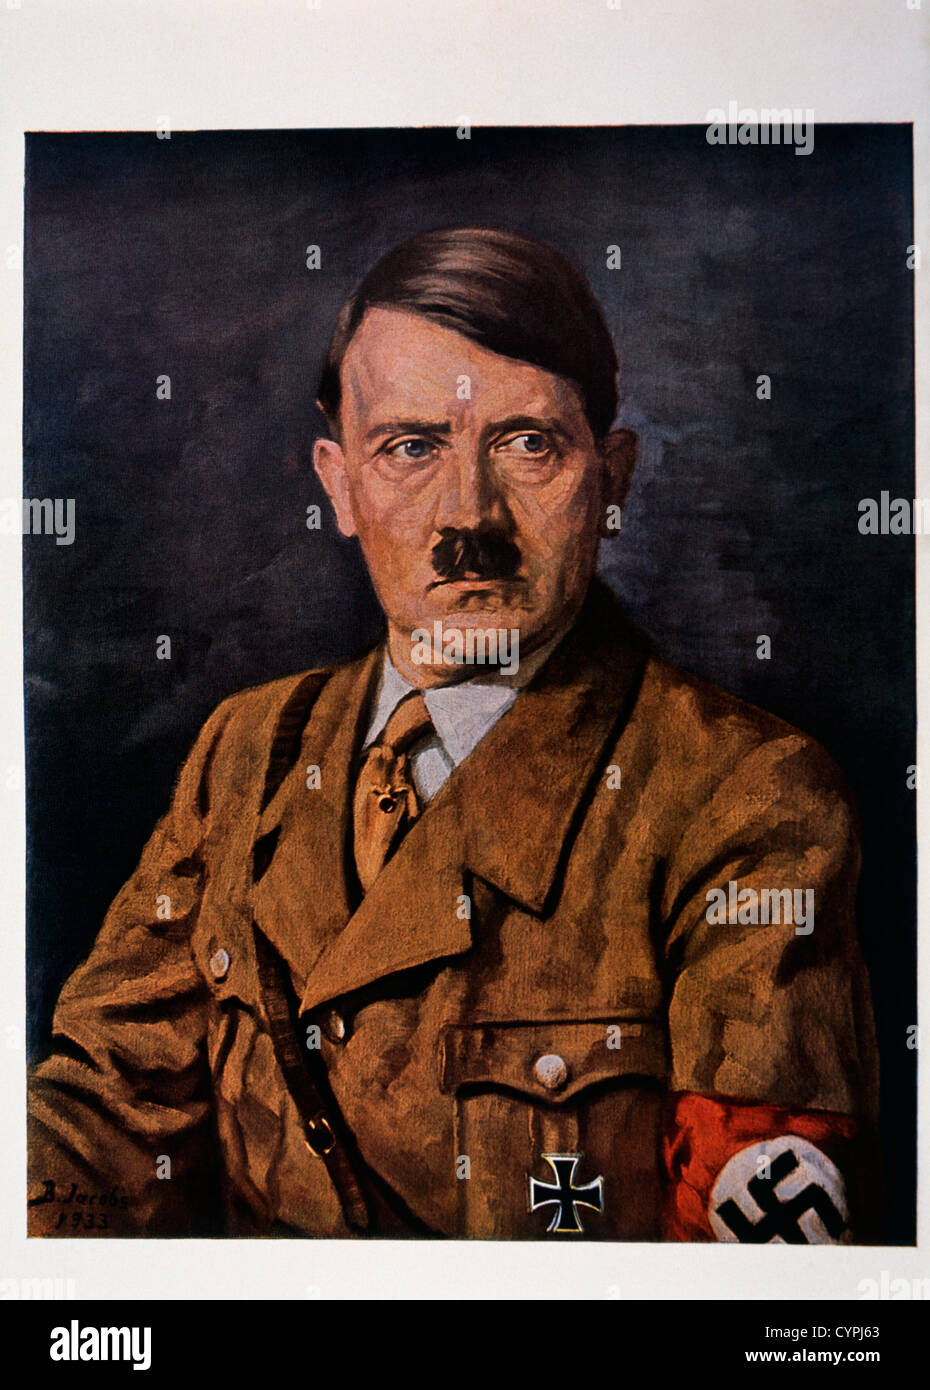 Adolf Hitler, Portrait, Painting, 1933 Stock Photo